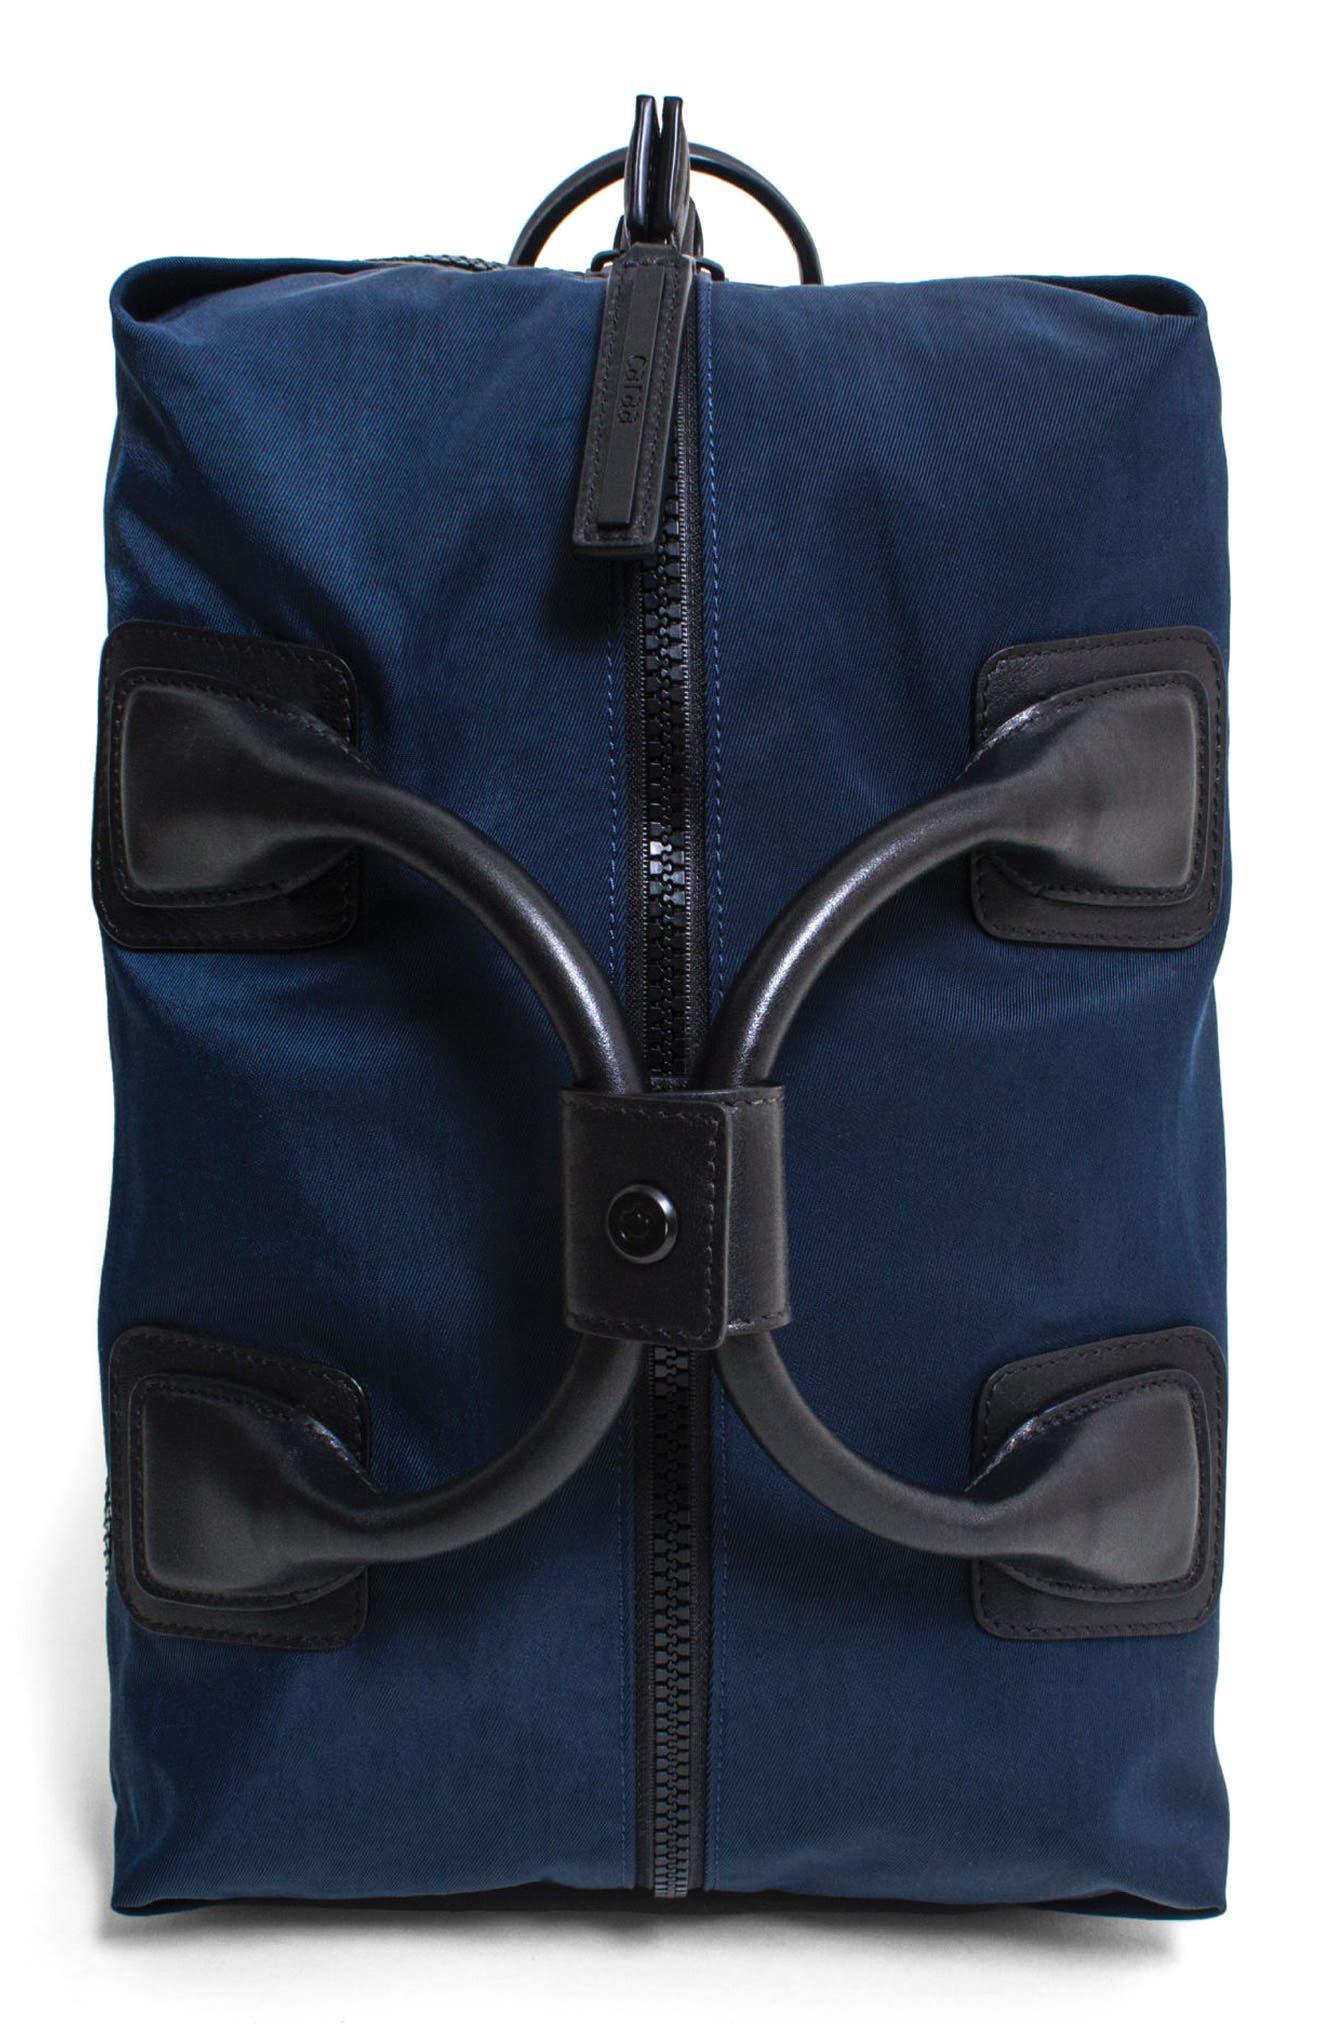 Caraa Studio 1.1 Convertible Duffel Bag